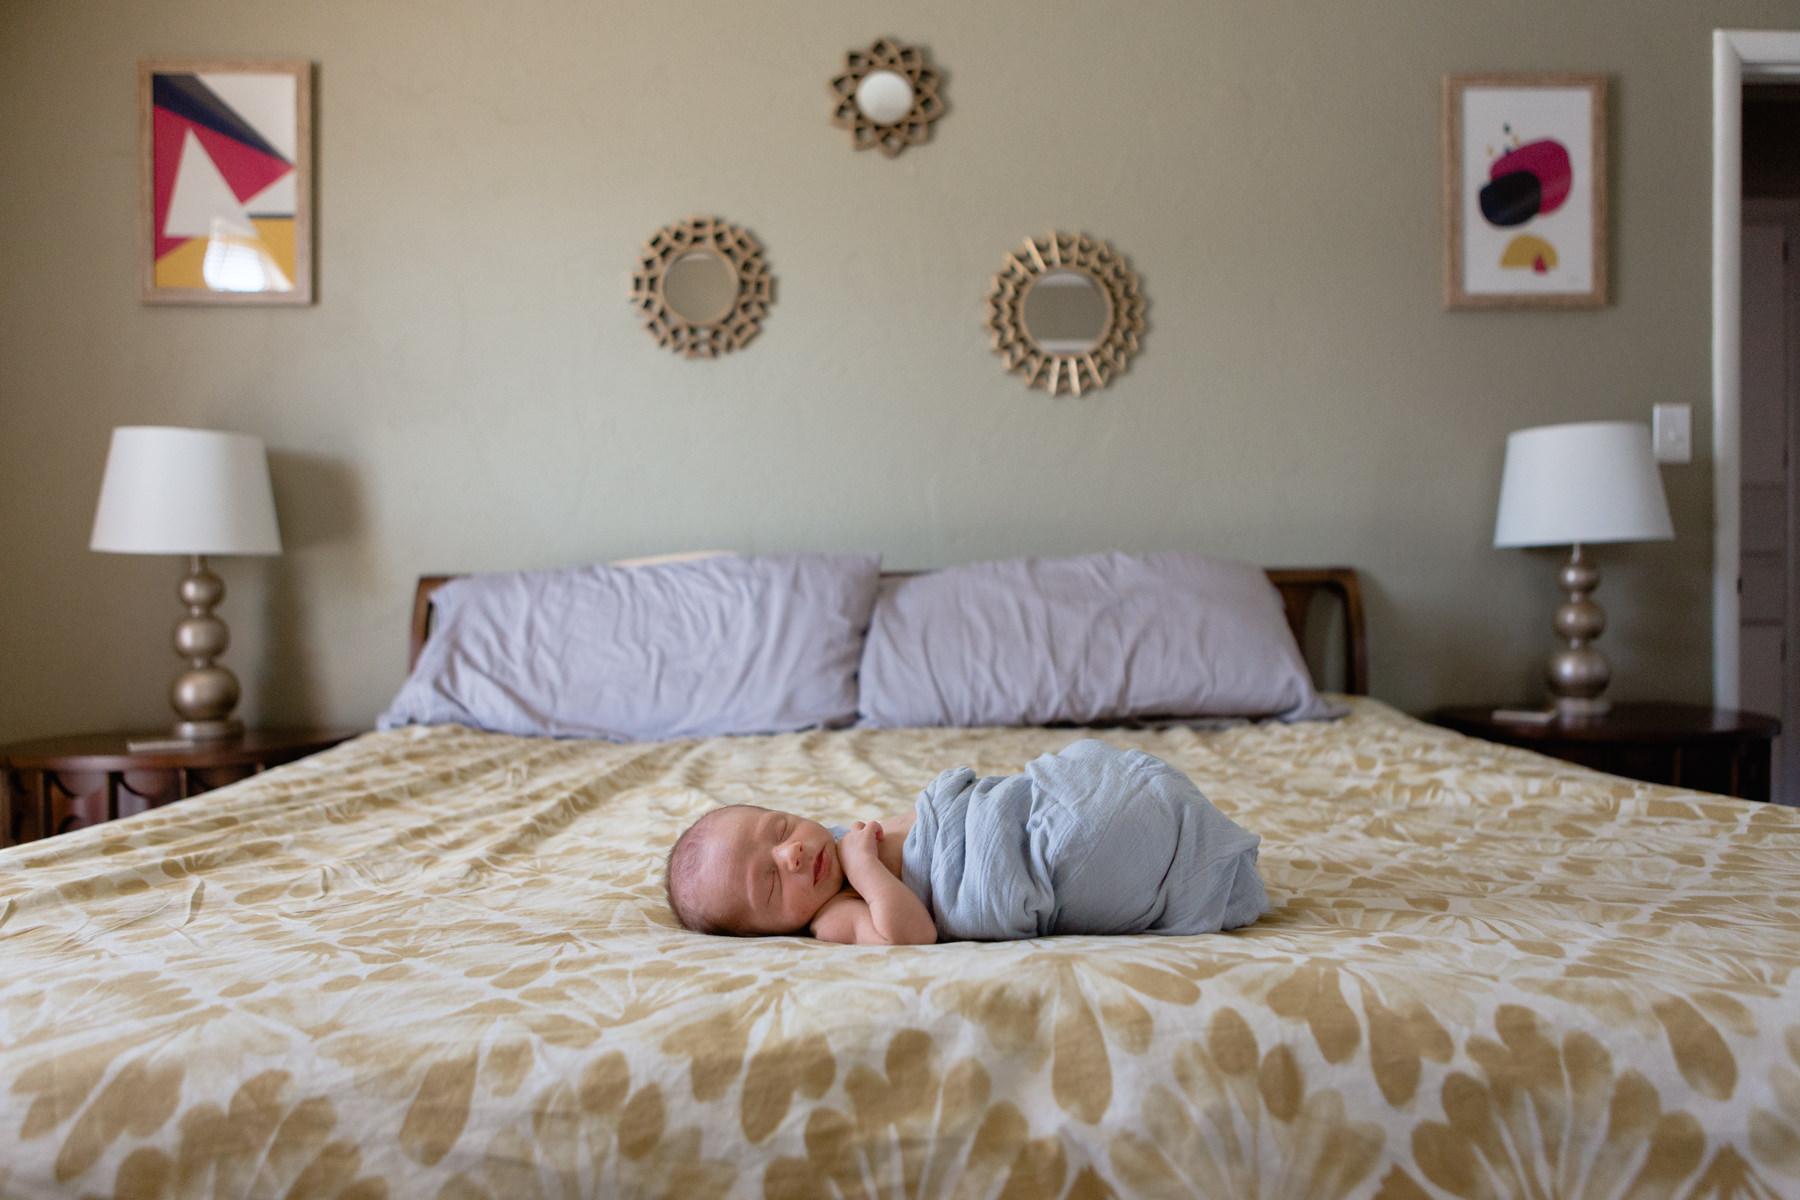 Newborn_Sleepy_Bed_OklahomaCity_Swaddled_In_Home.JPG